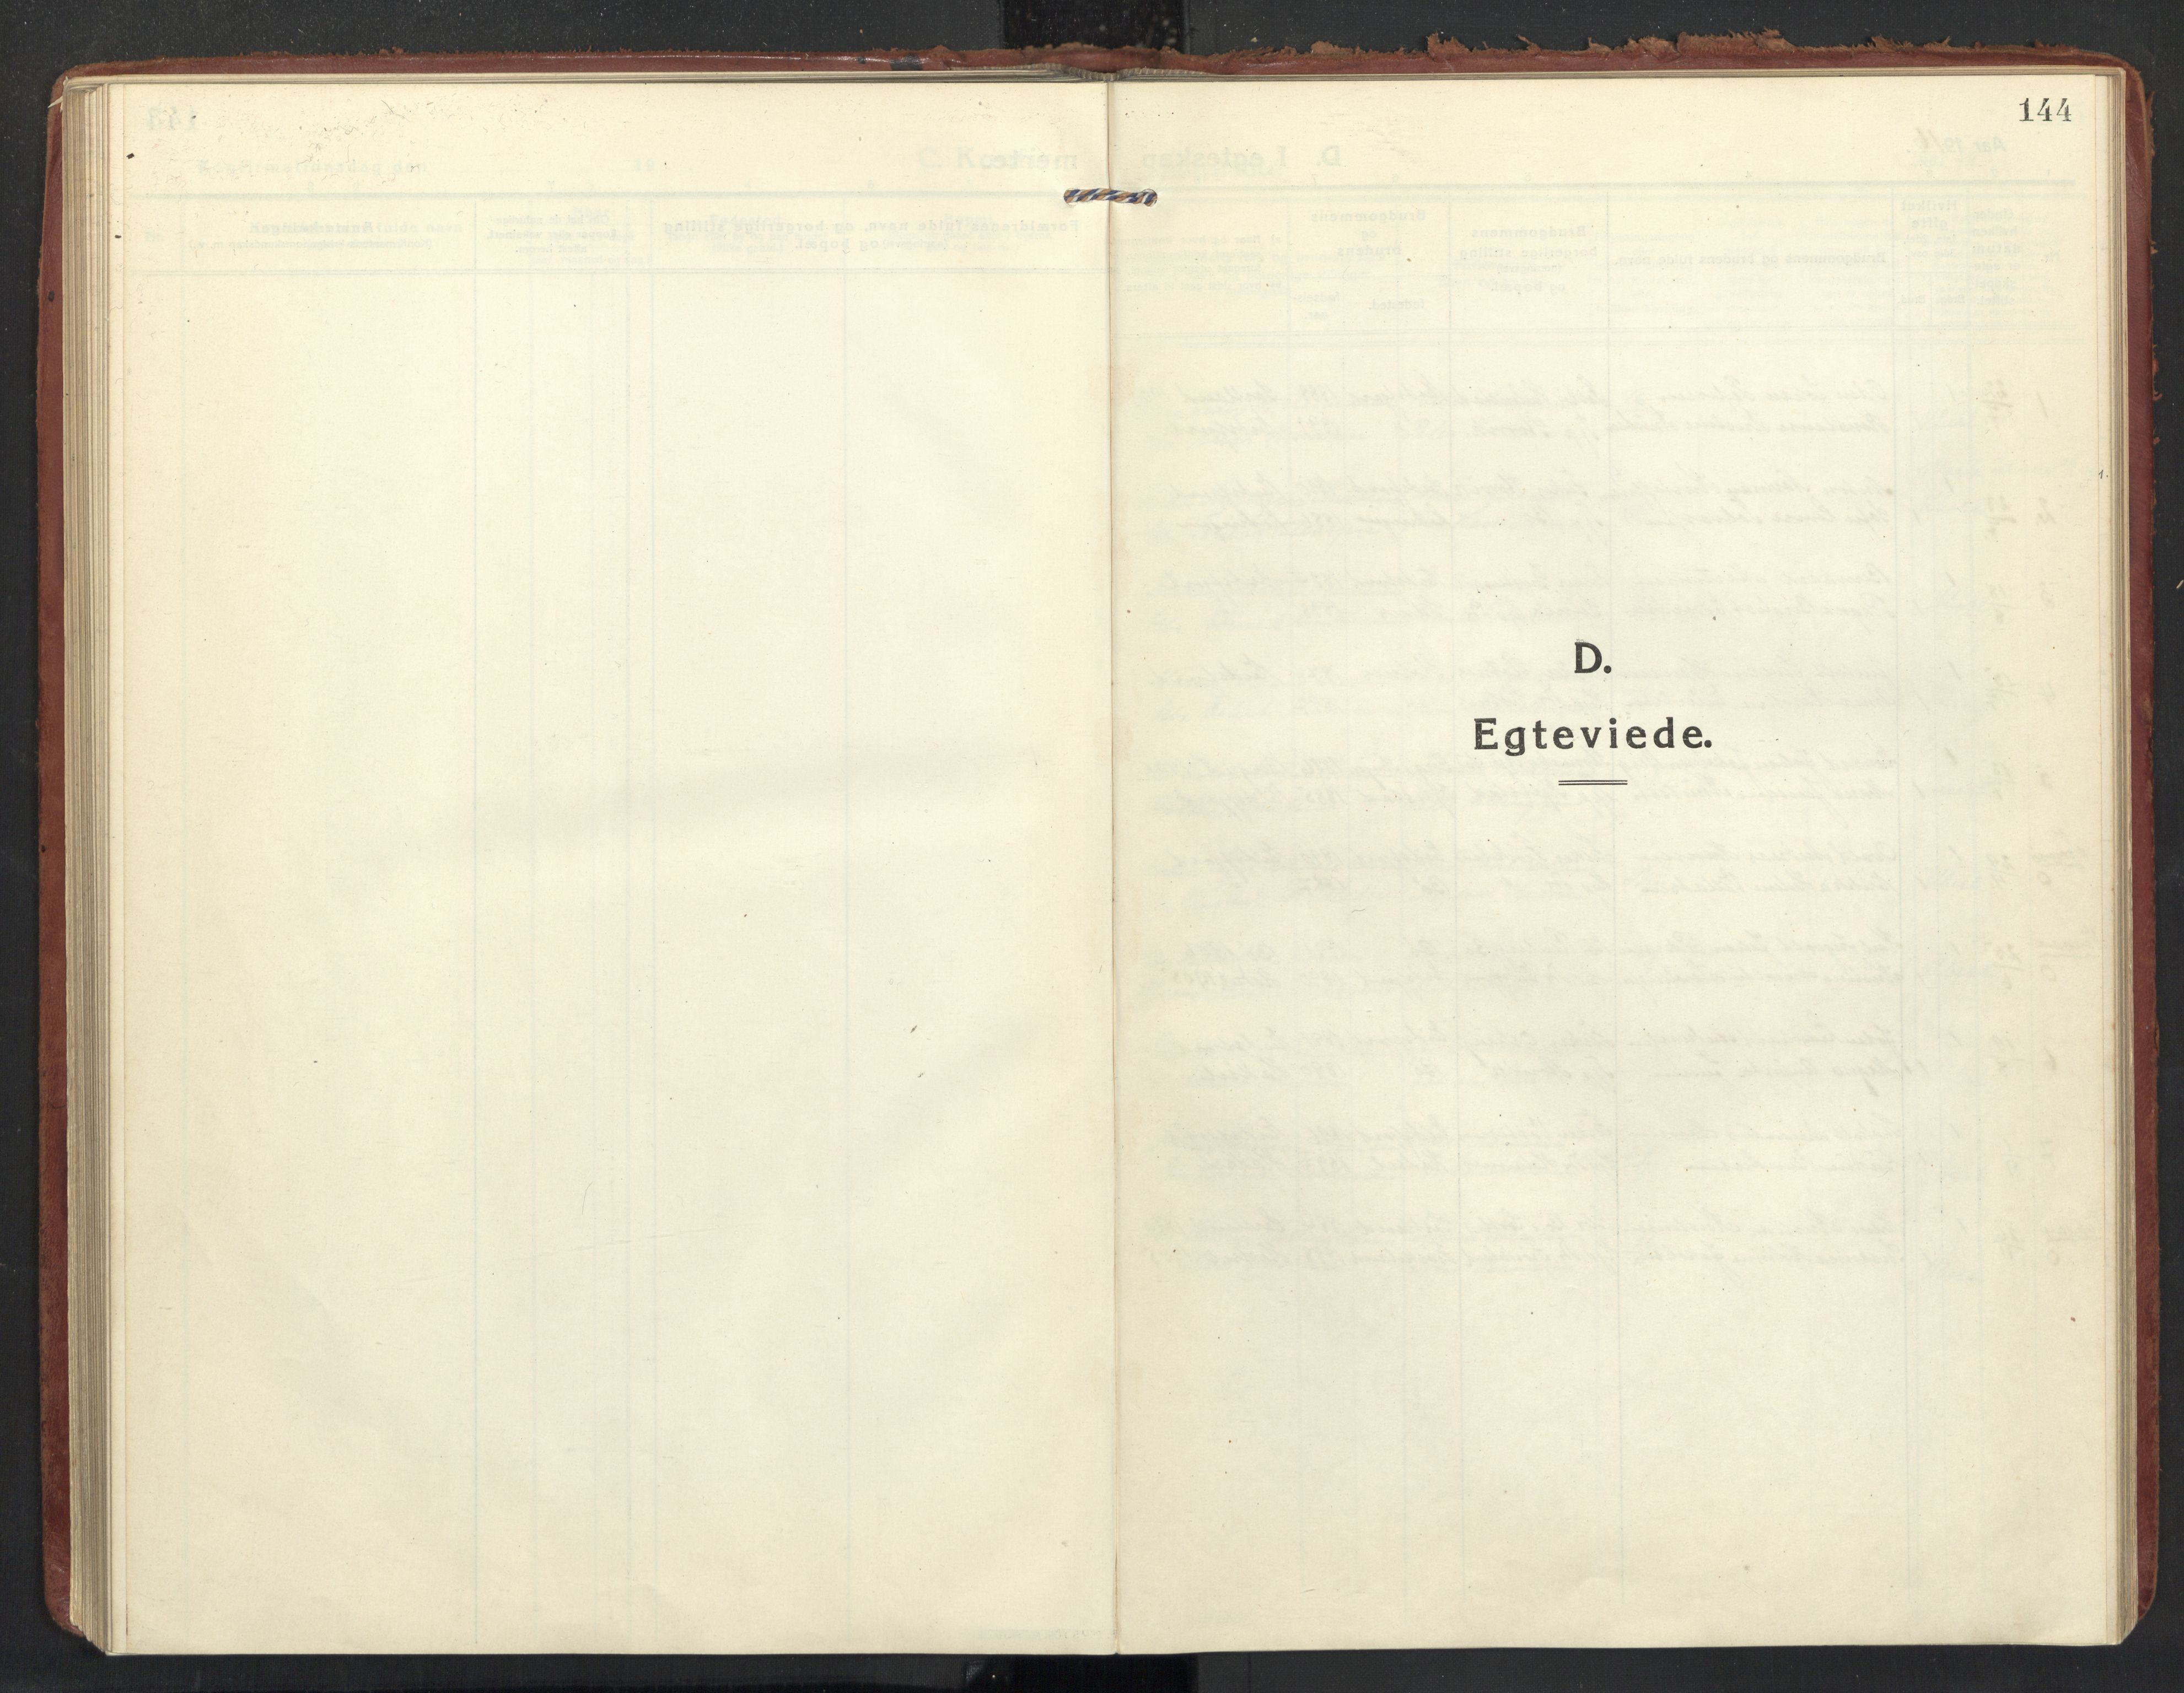 SAT, Ministerialprotokoller, klokkerbøker og fødselsregistre - Nordland, 890/L1288: Ministerialbok nr. 890A03, 1915-1925, s. 144